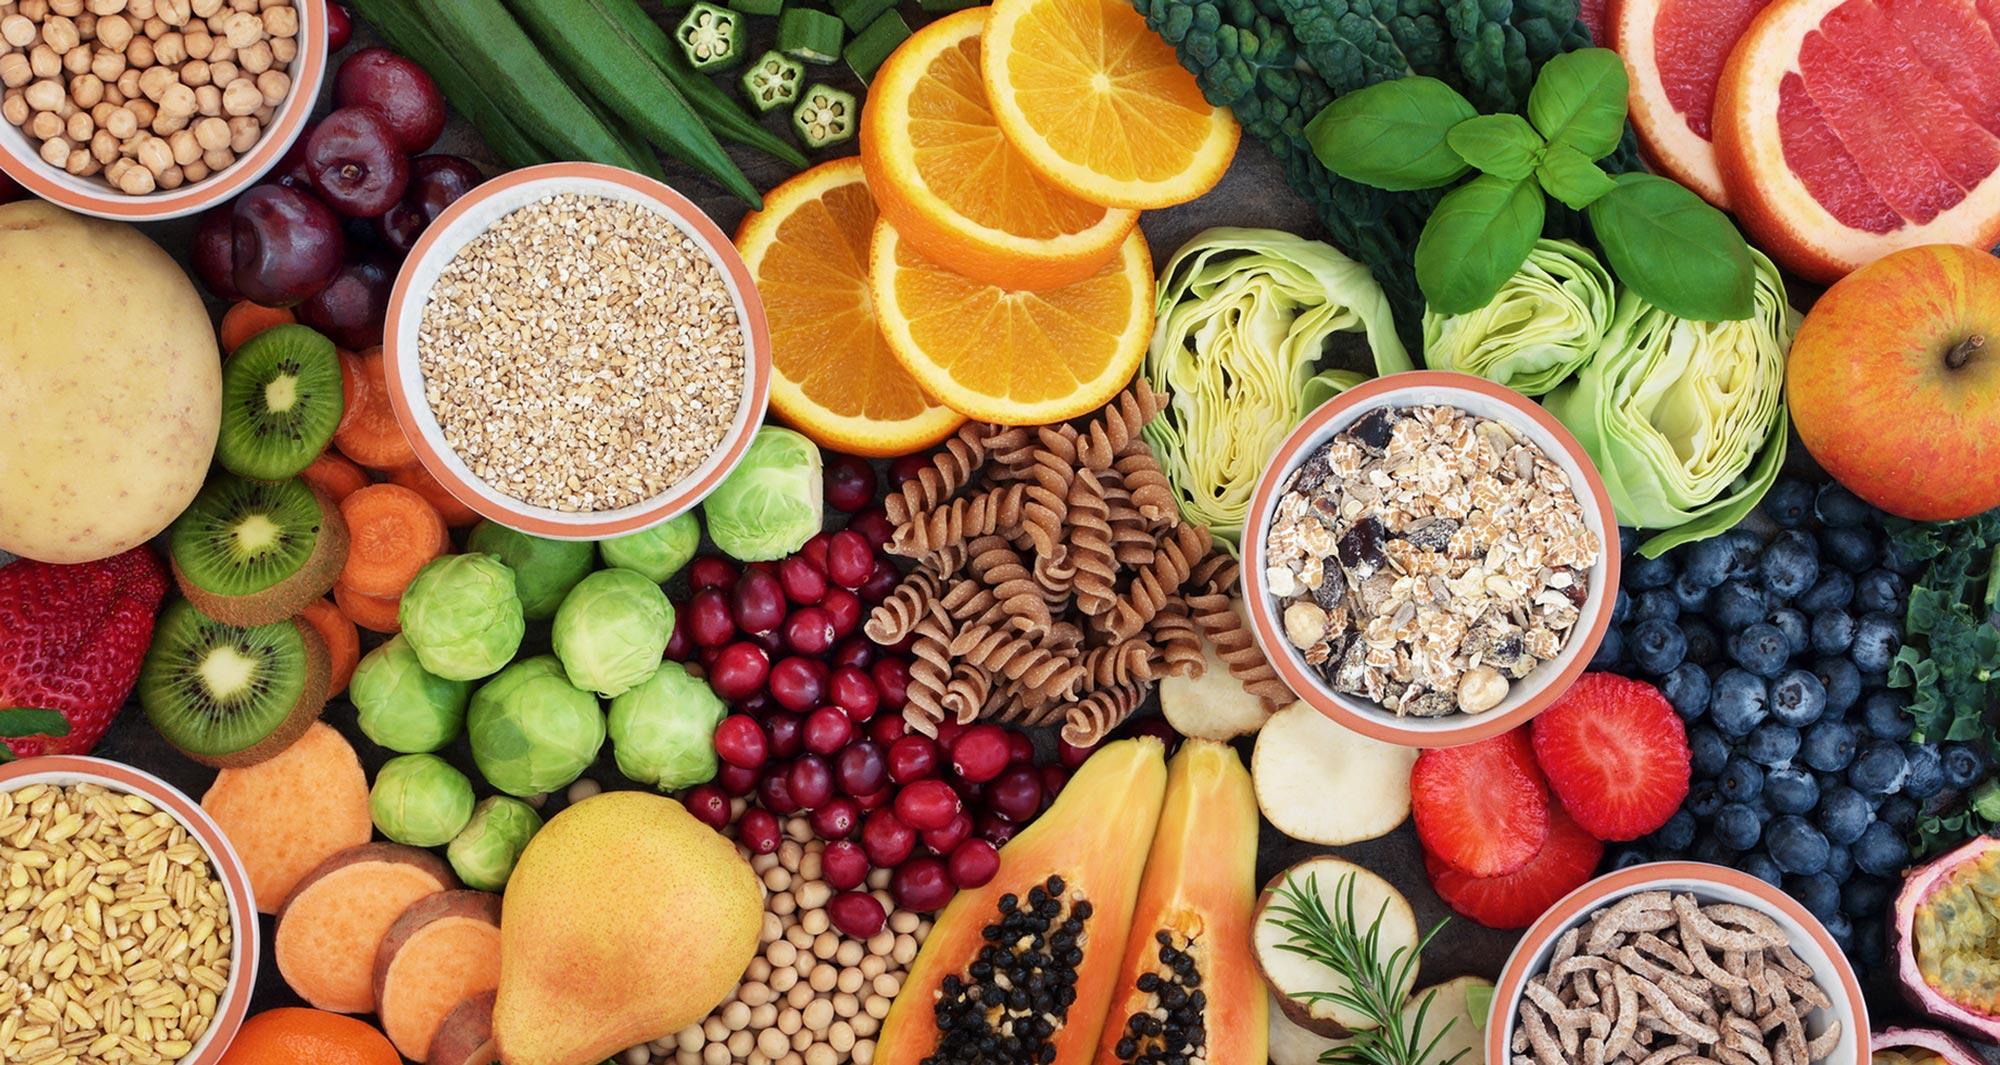 Unhealthy Foods That Seem Healthy